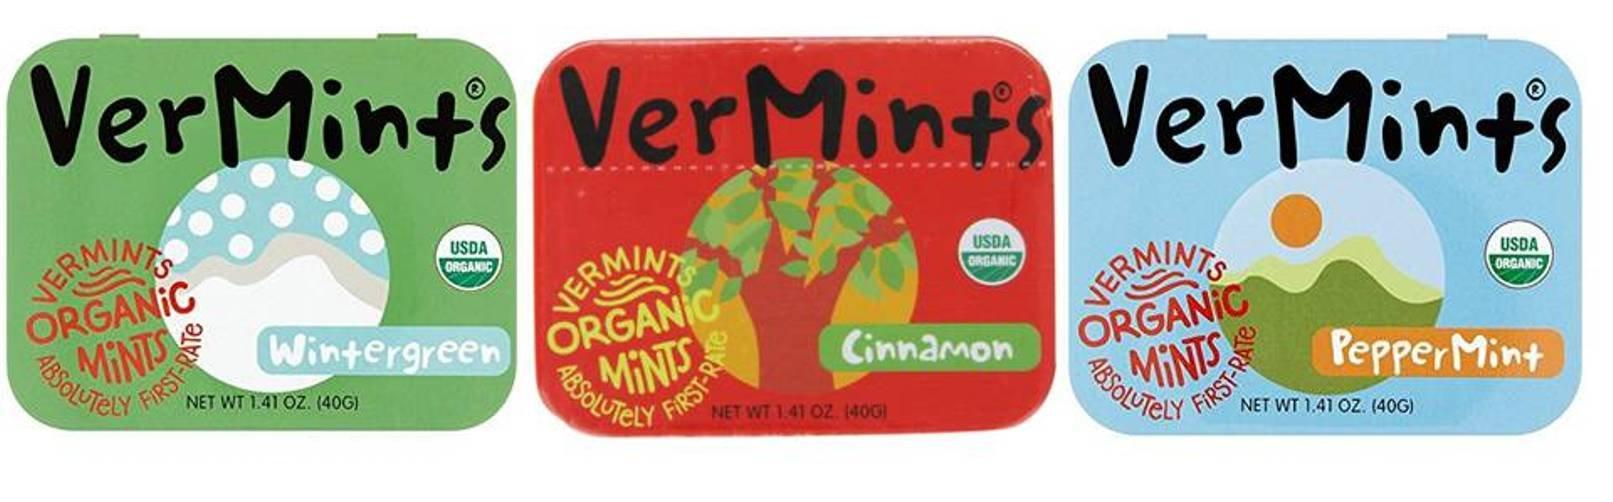 VerMints Organic Gluten Free Non-GMO Vegan Candy Mints 3 Flavor Variety Bundle: (1) Peppermint, (1) Cinnamon, and (1) Wintergreen